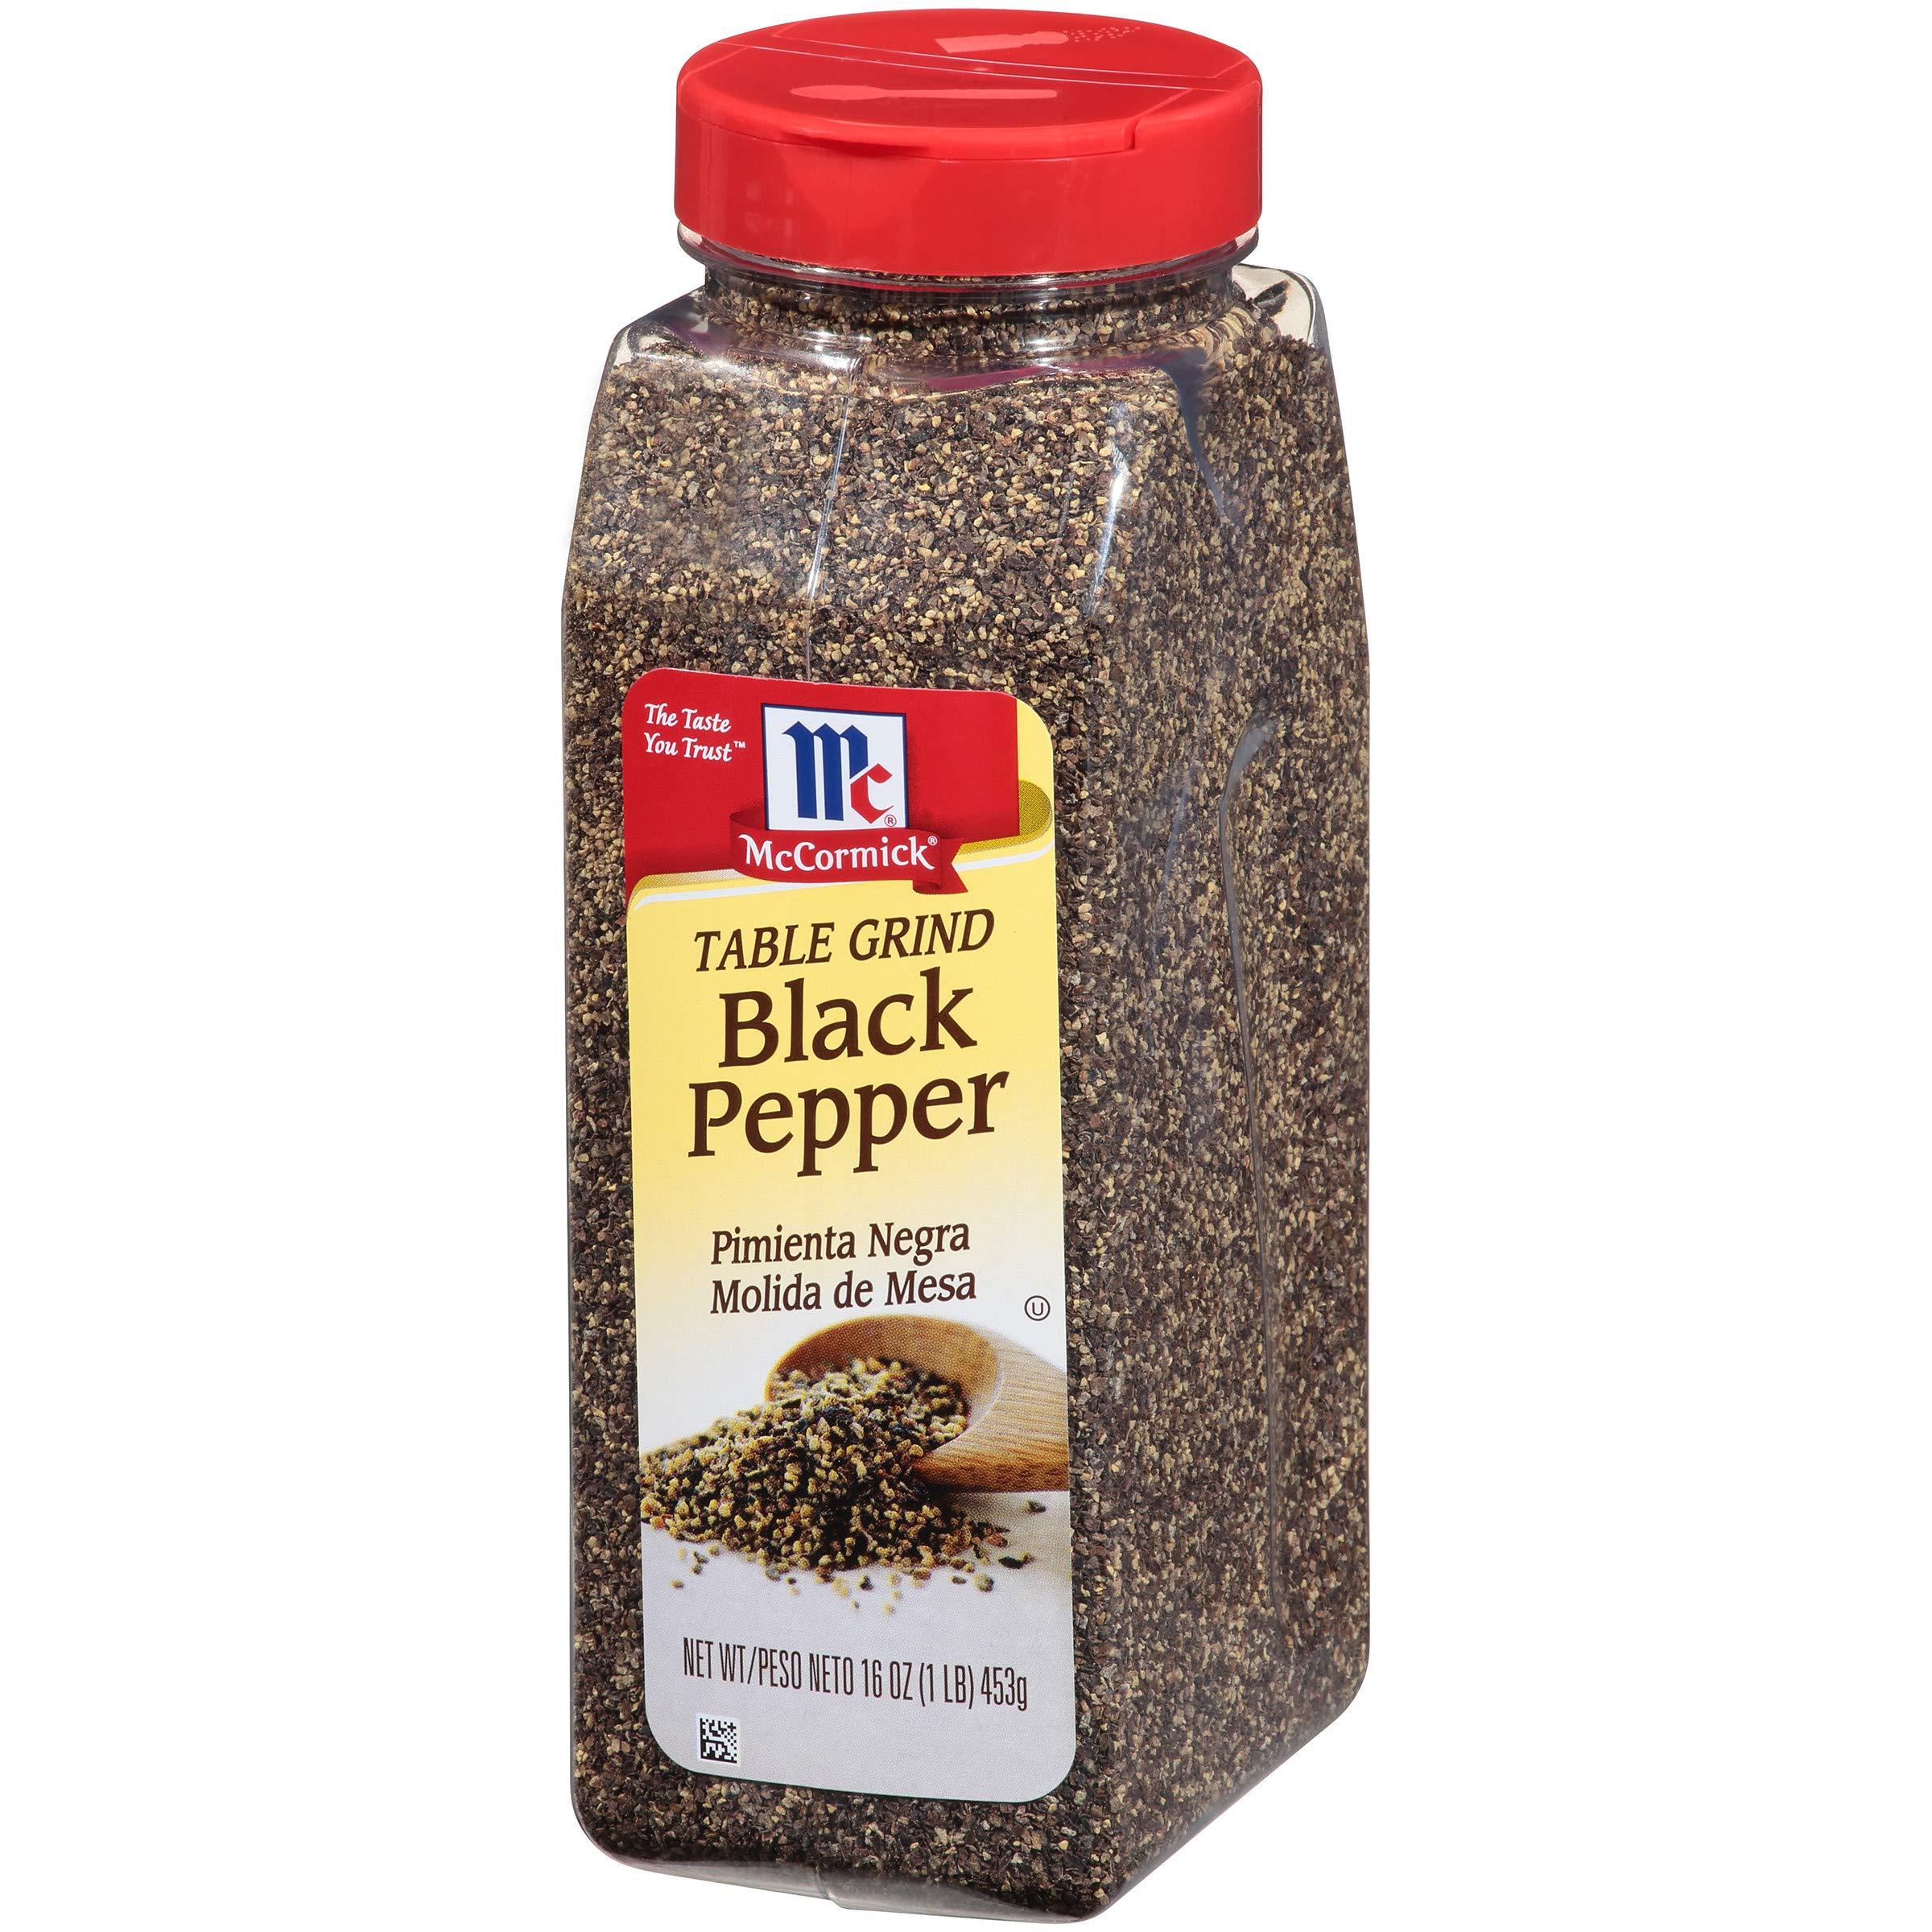 McCormick Table Ground Black Pepper, Black Pepper Seasoning, 16 oz by McCormick (Image #1)